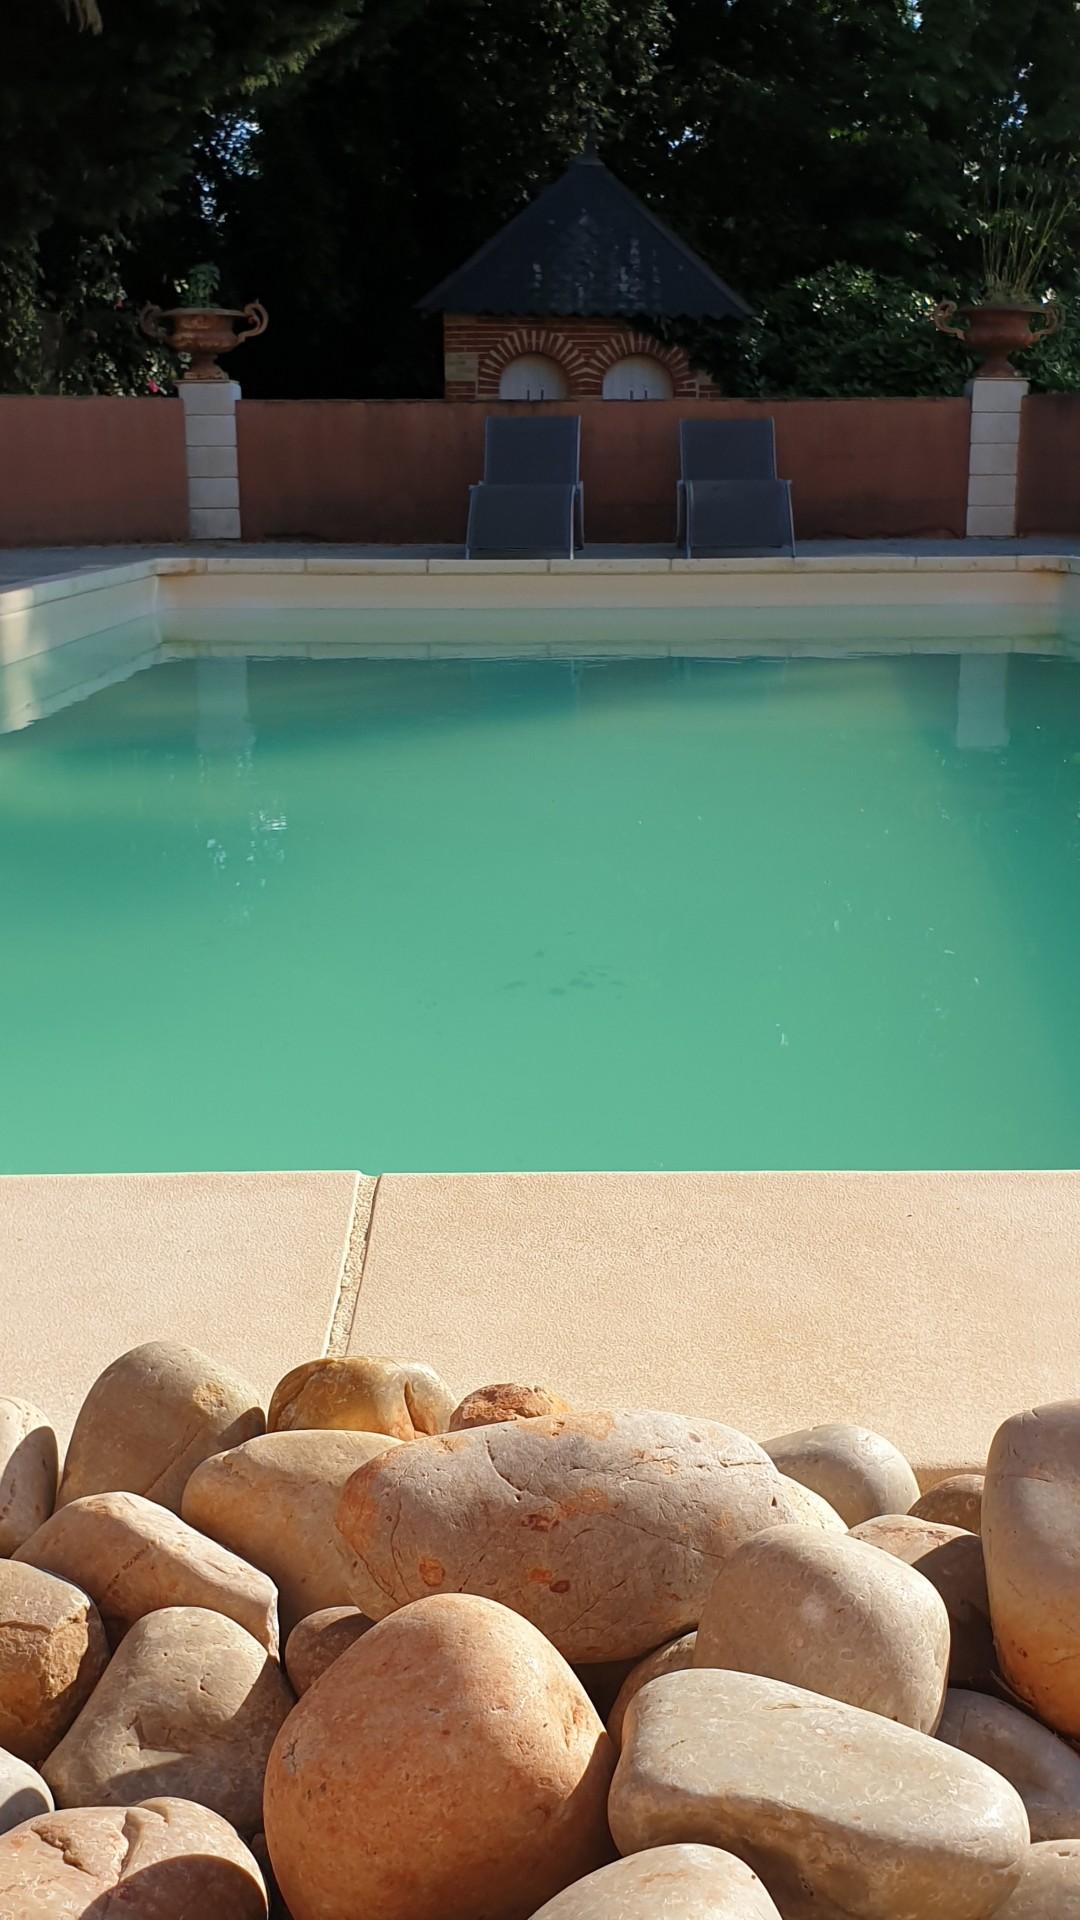 ch-908-e-pool1-616